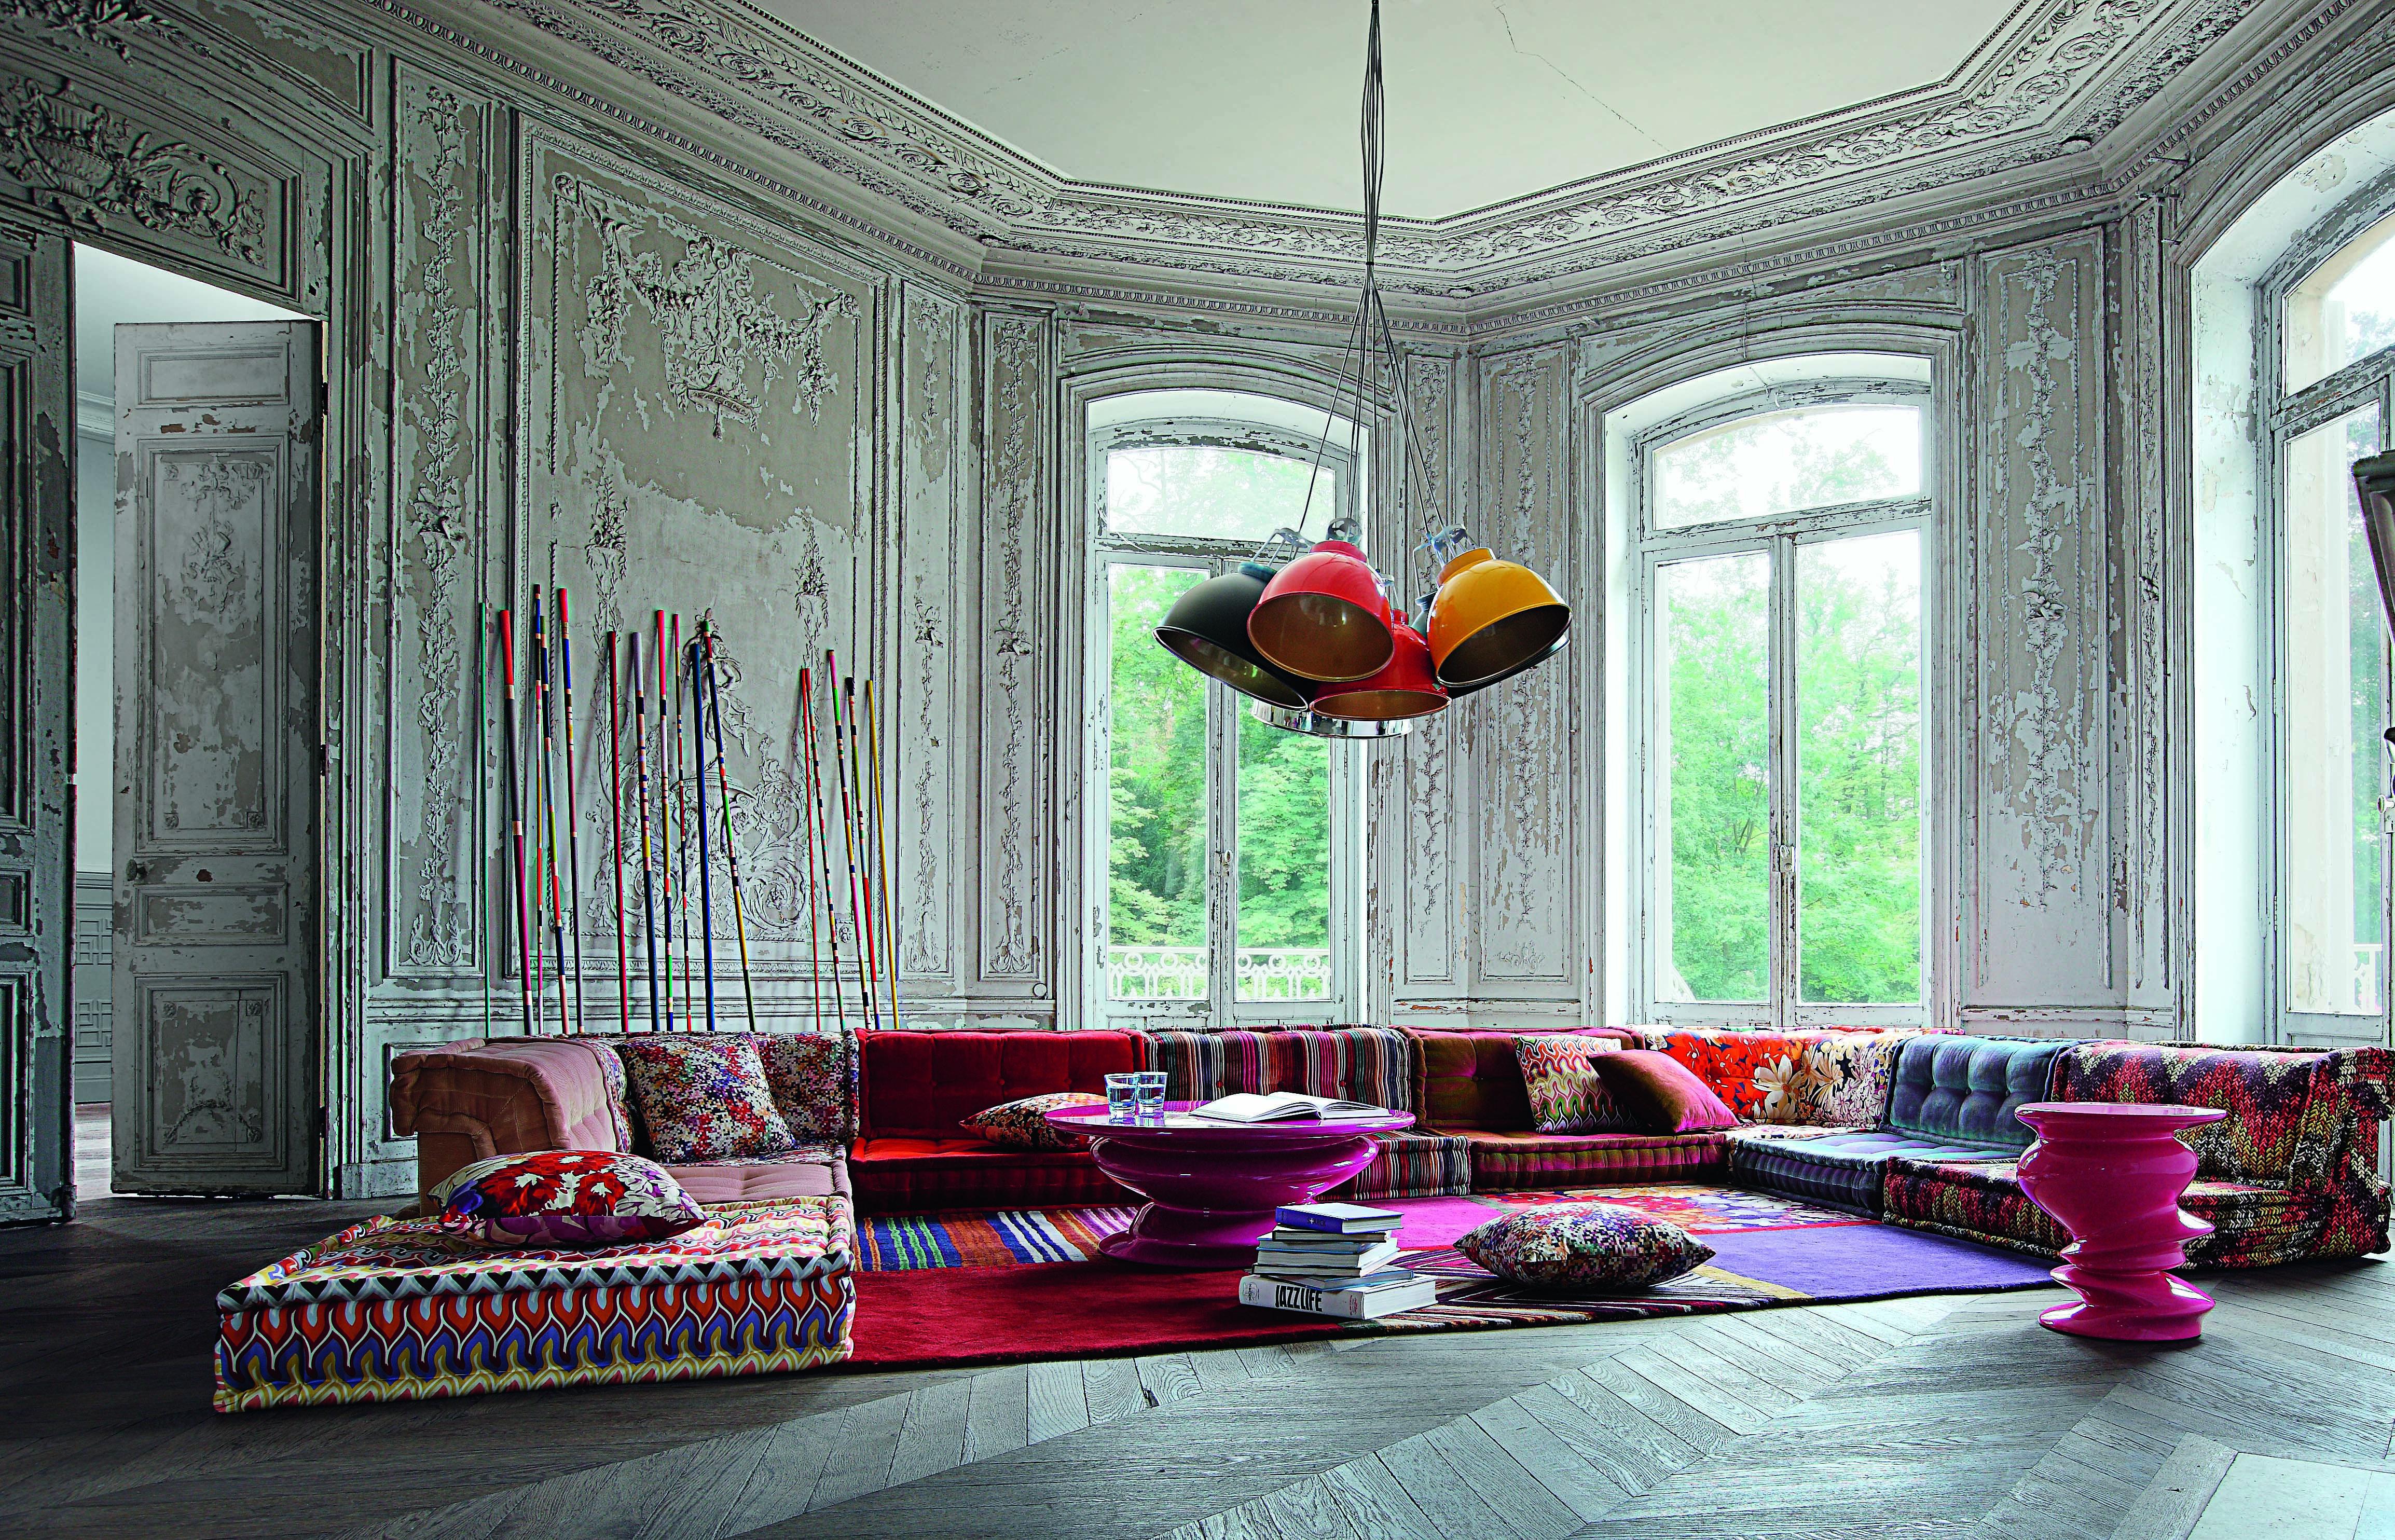 Roche Bobois Mah Jong Modular Sofa Upholstered In Missoni Home Fabrics Mahjong Sofa Ro Contemporary Home Furniture Missoni Home Moroccan Decor Living Room